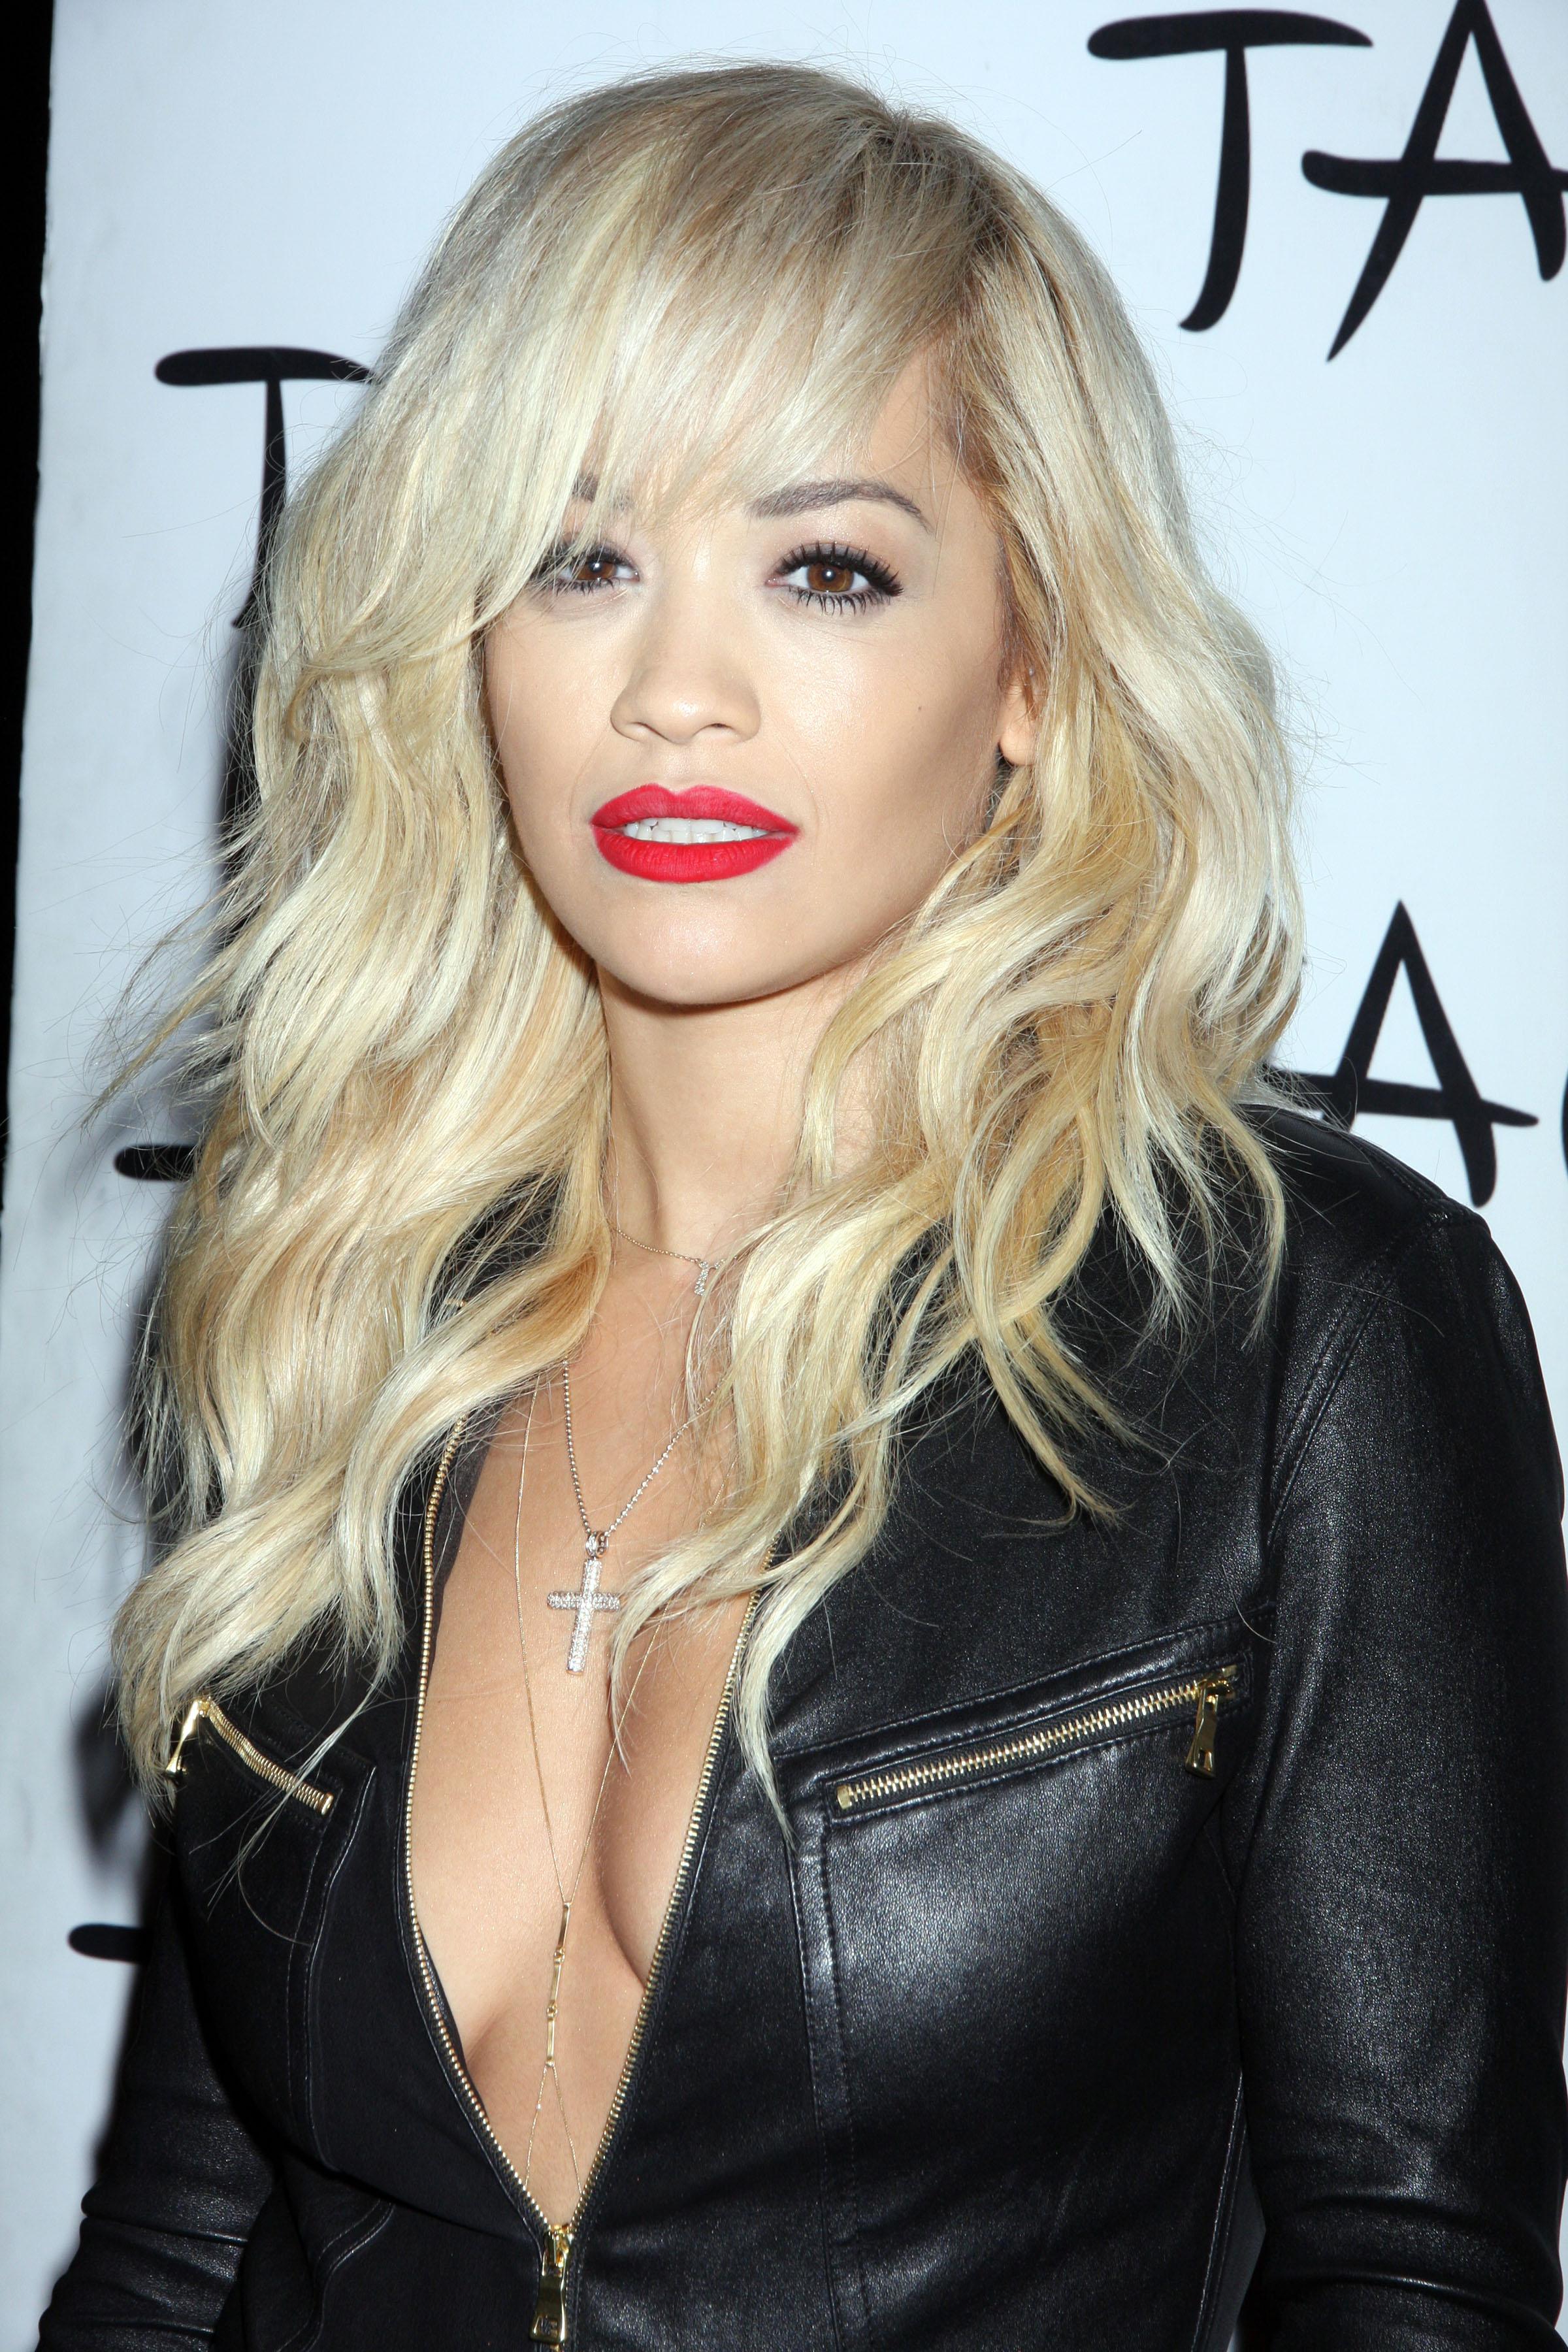 Rita Ora hosts TAO Nightclub in Las Vegas, NV